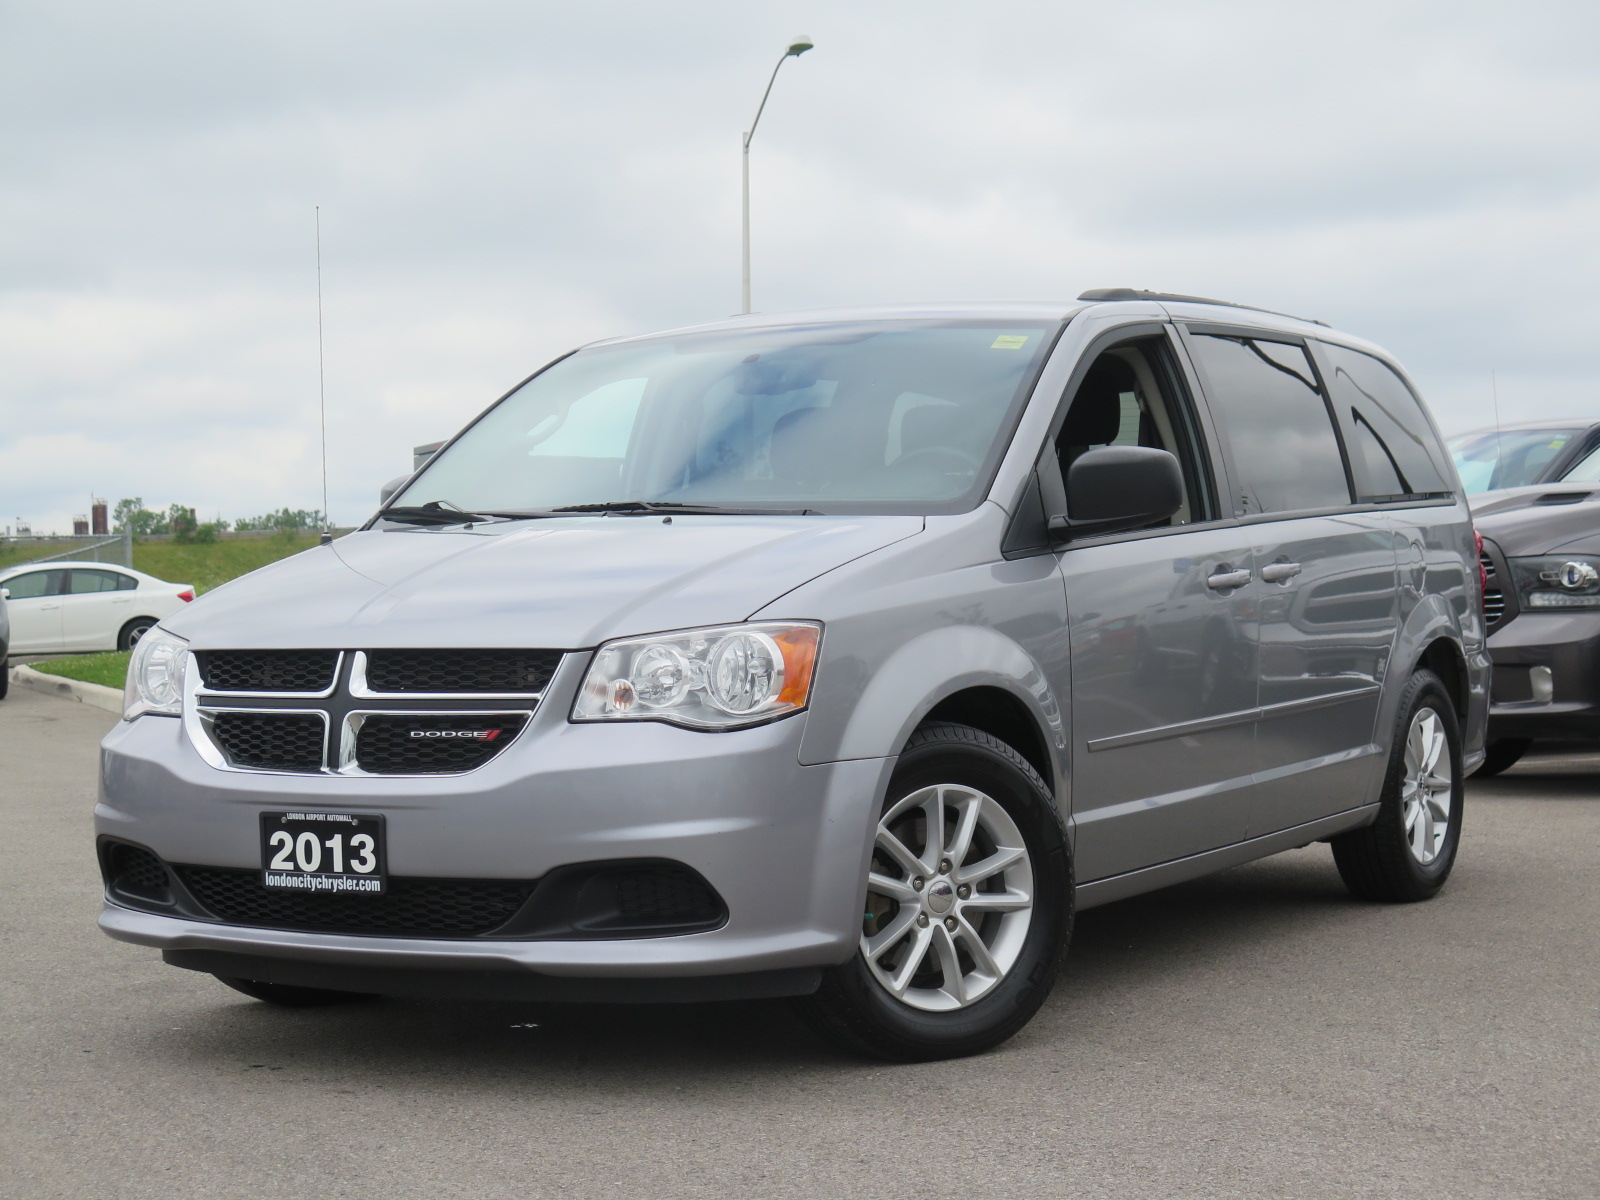 New 2013 Dodge Grand Caravan, $13922